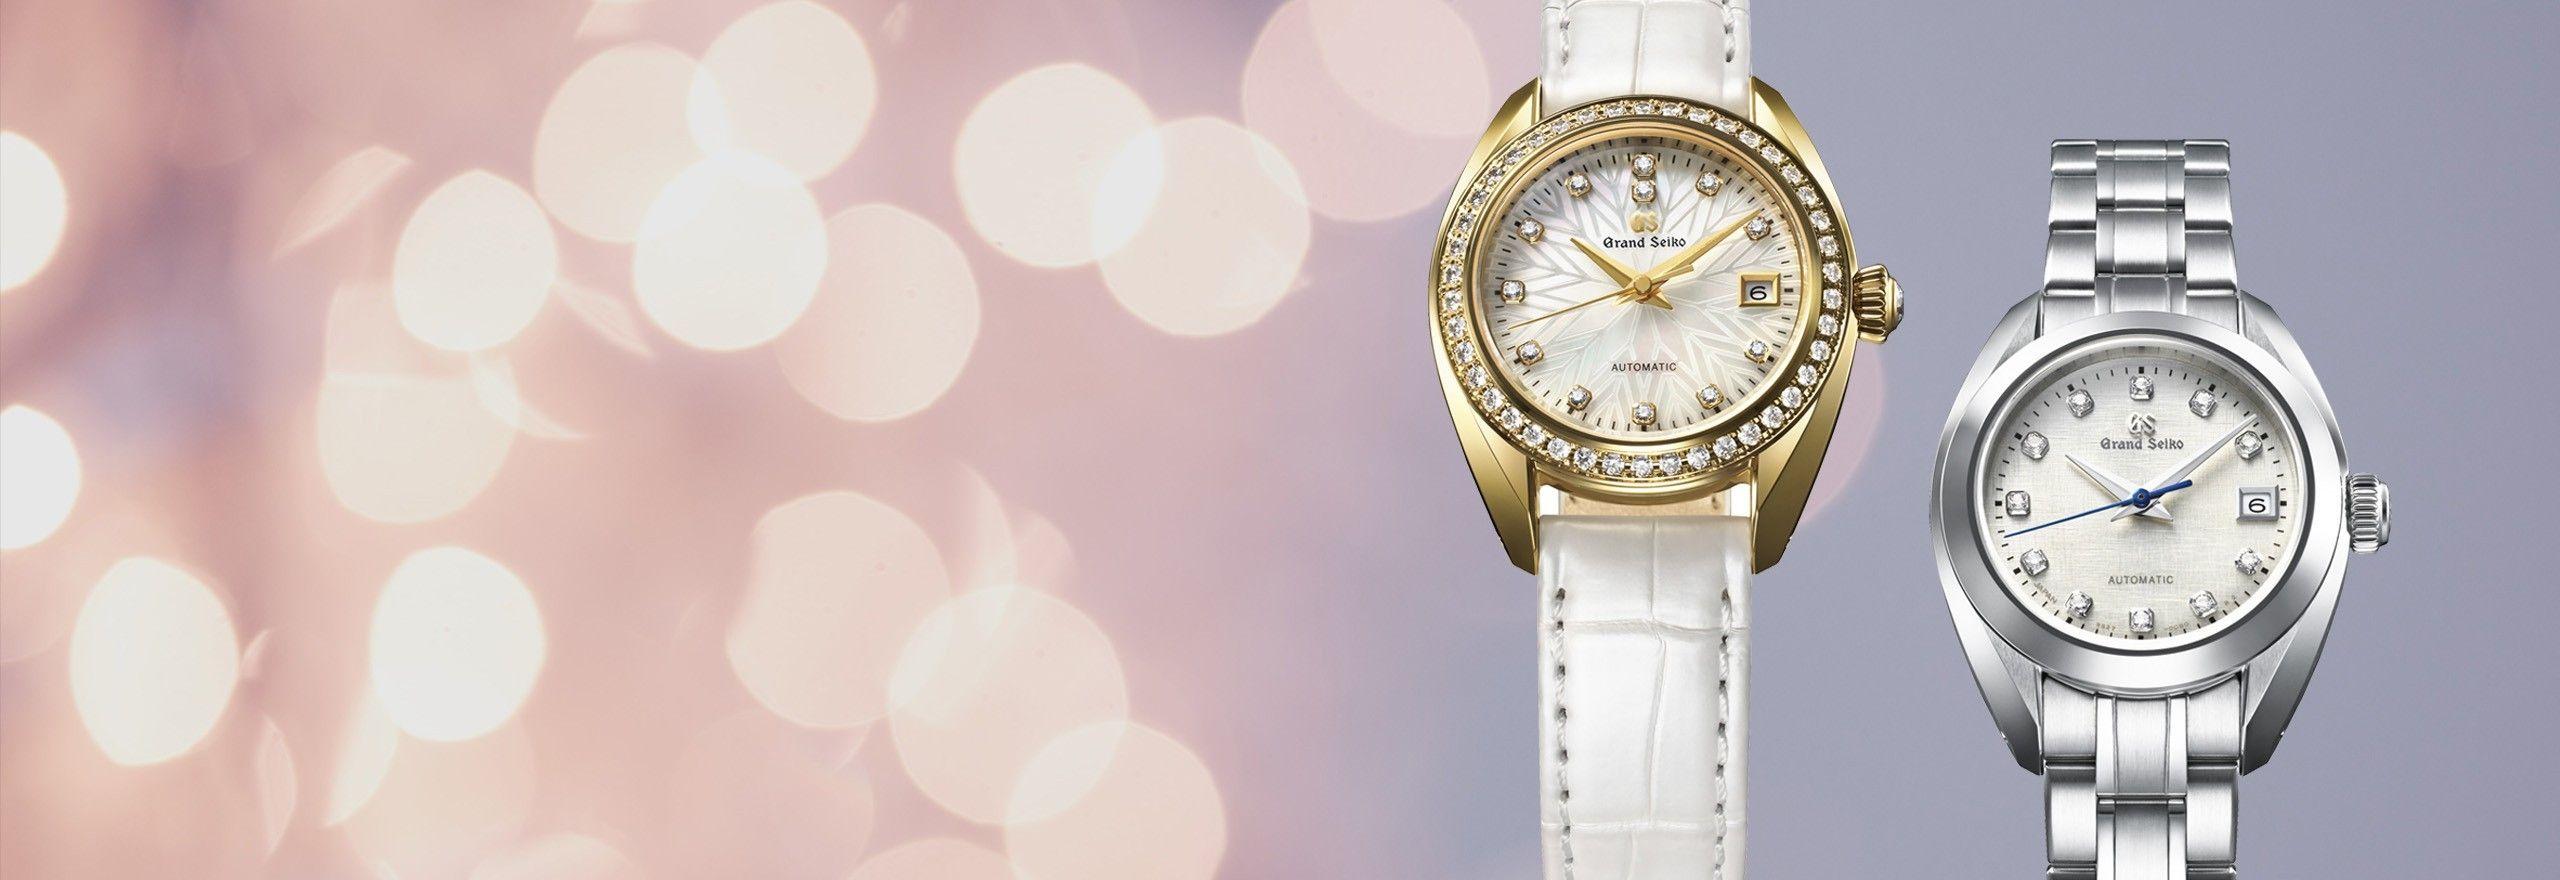 Relojes Mujer Grand Seiko. Seiko Boutique Madrid Tienda Oficial